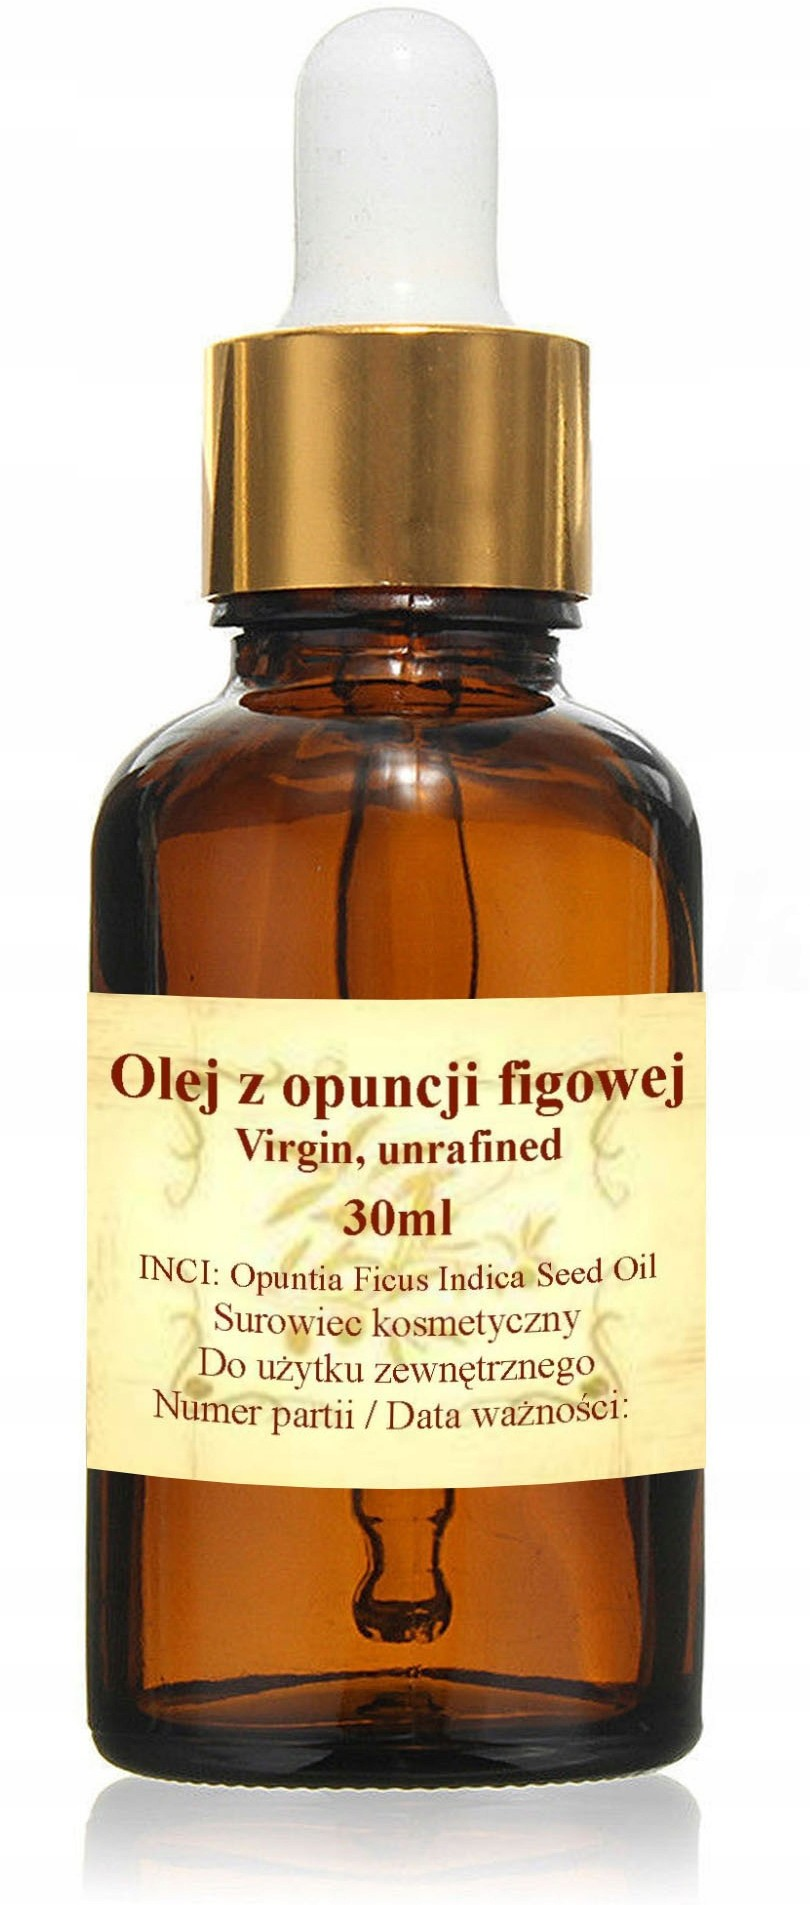 Olej Z Opuncji Figowej 30ml - virgin, unrafined